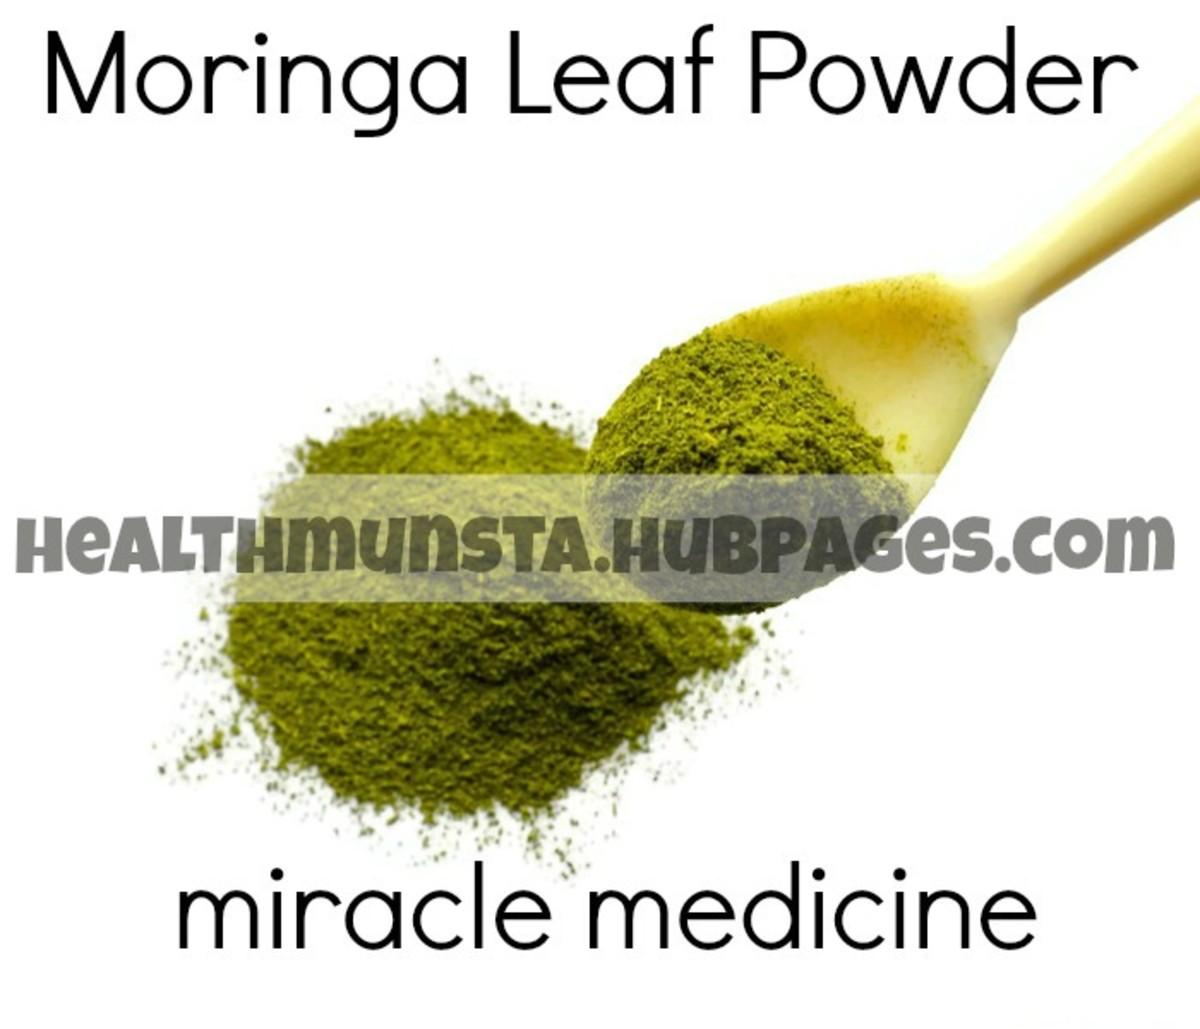 10 Miracle Moringa Leaf Powder Uses